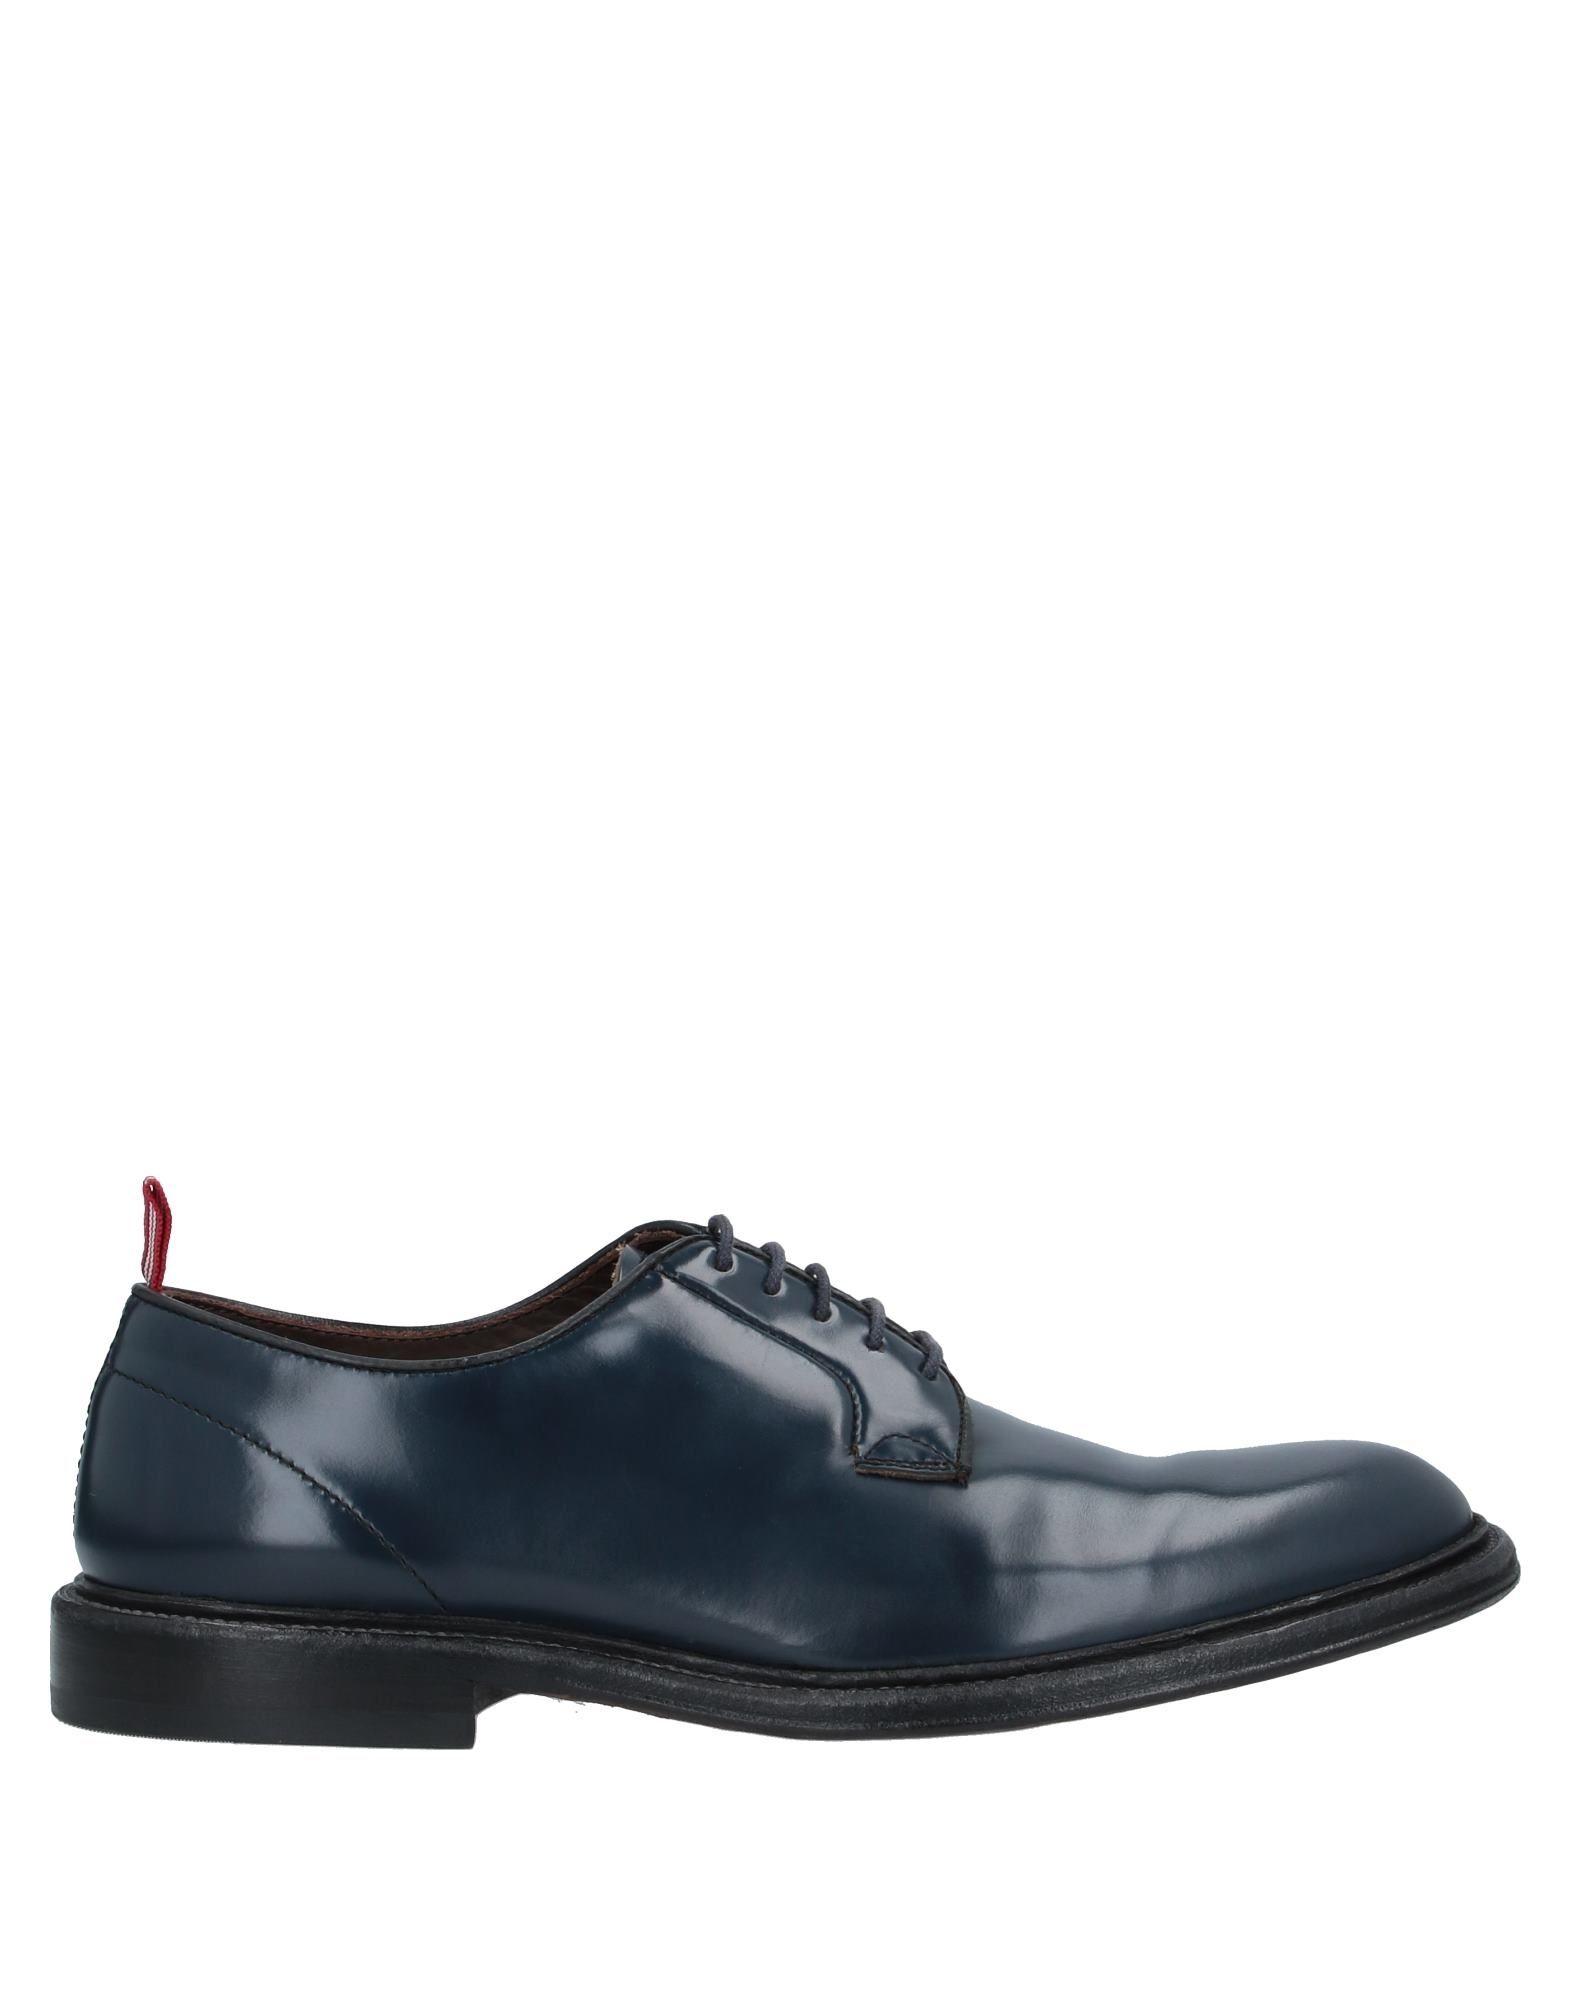 FRANK ROX Обувь на шнурках ботильоны кожаные rox